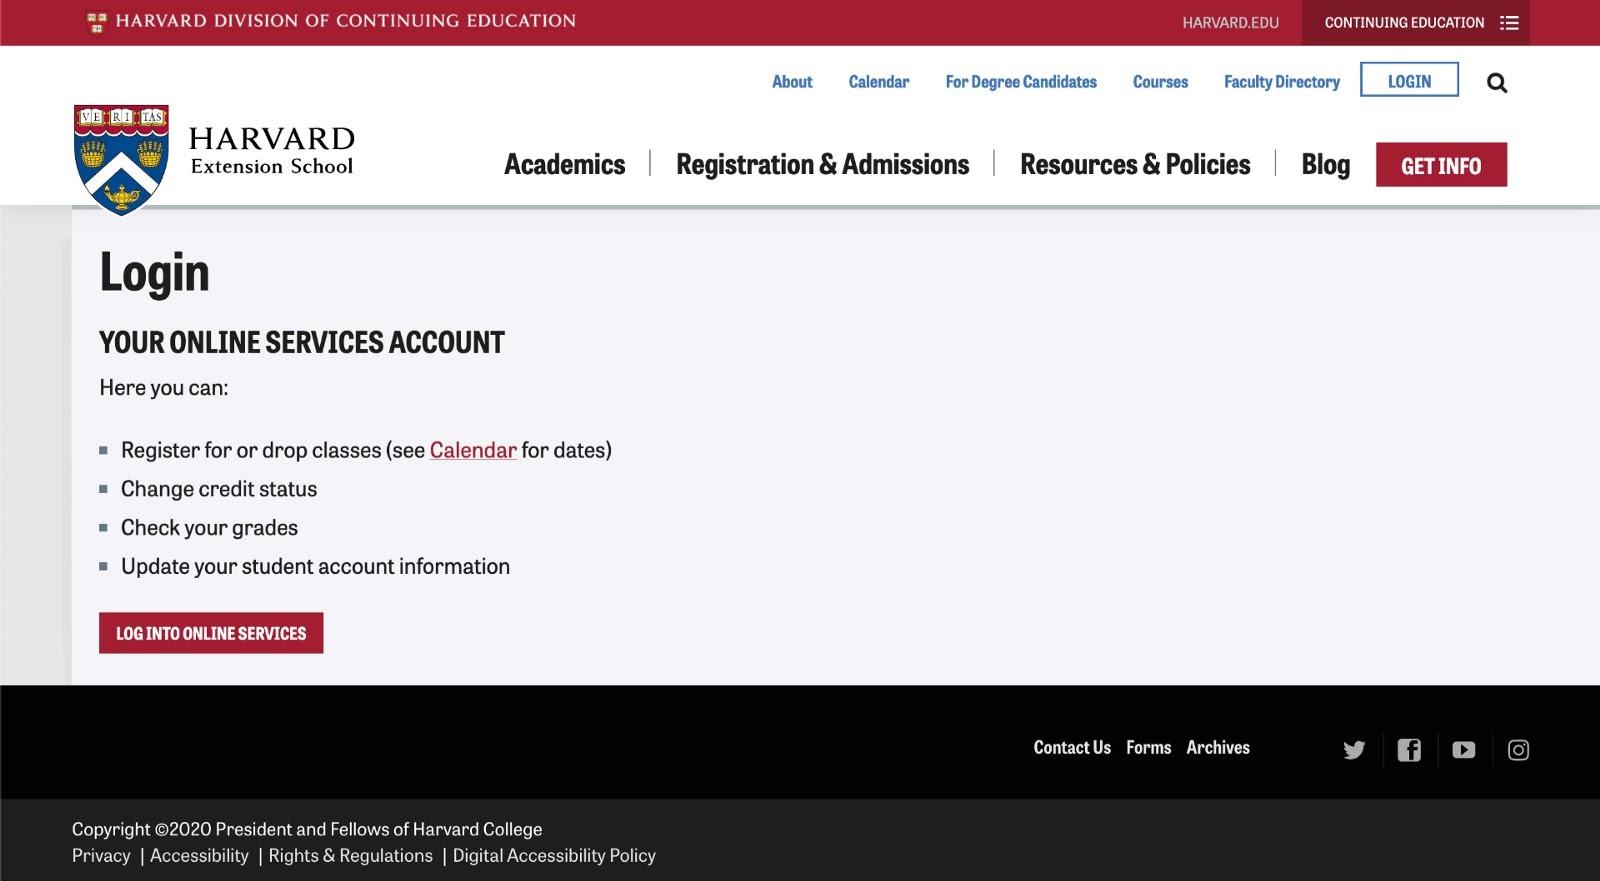 Example of a web portal login for Harvard University